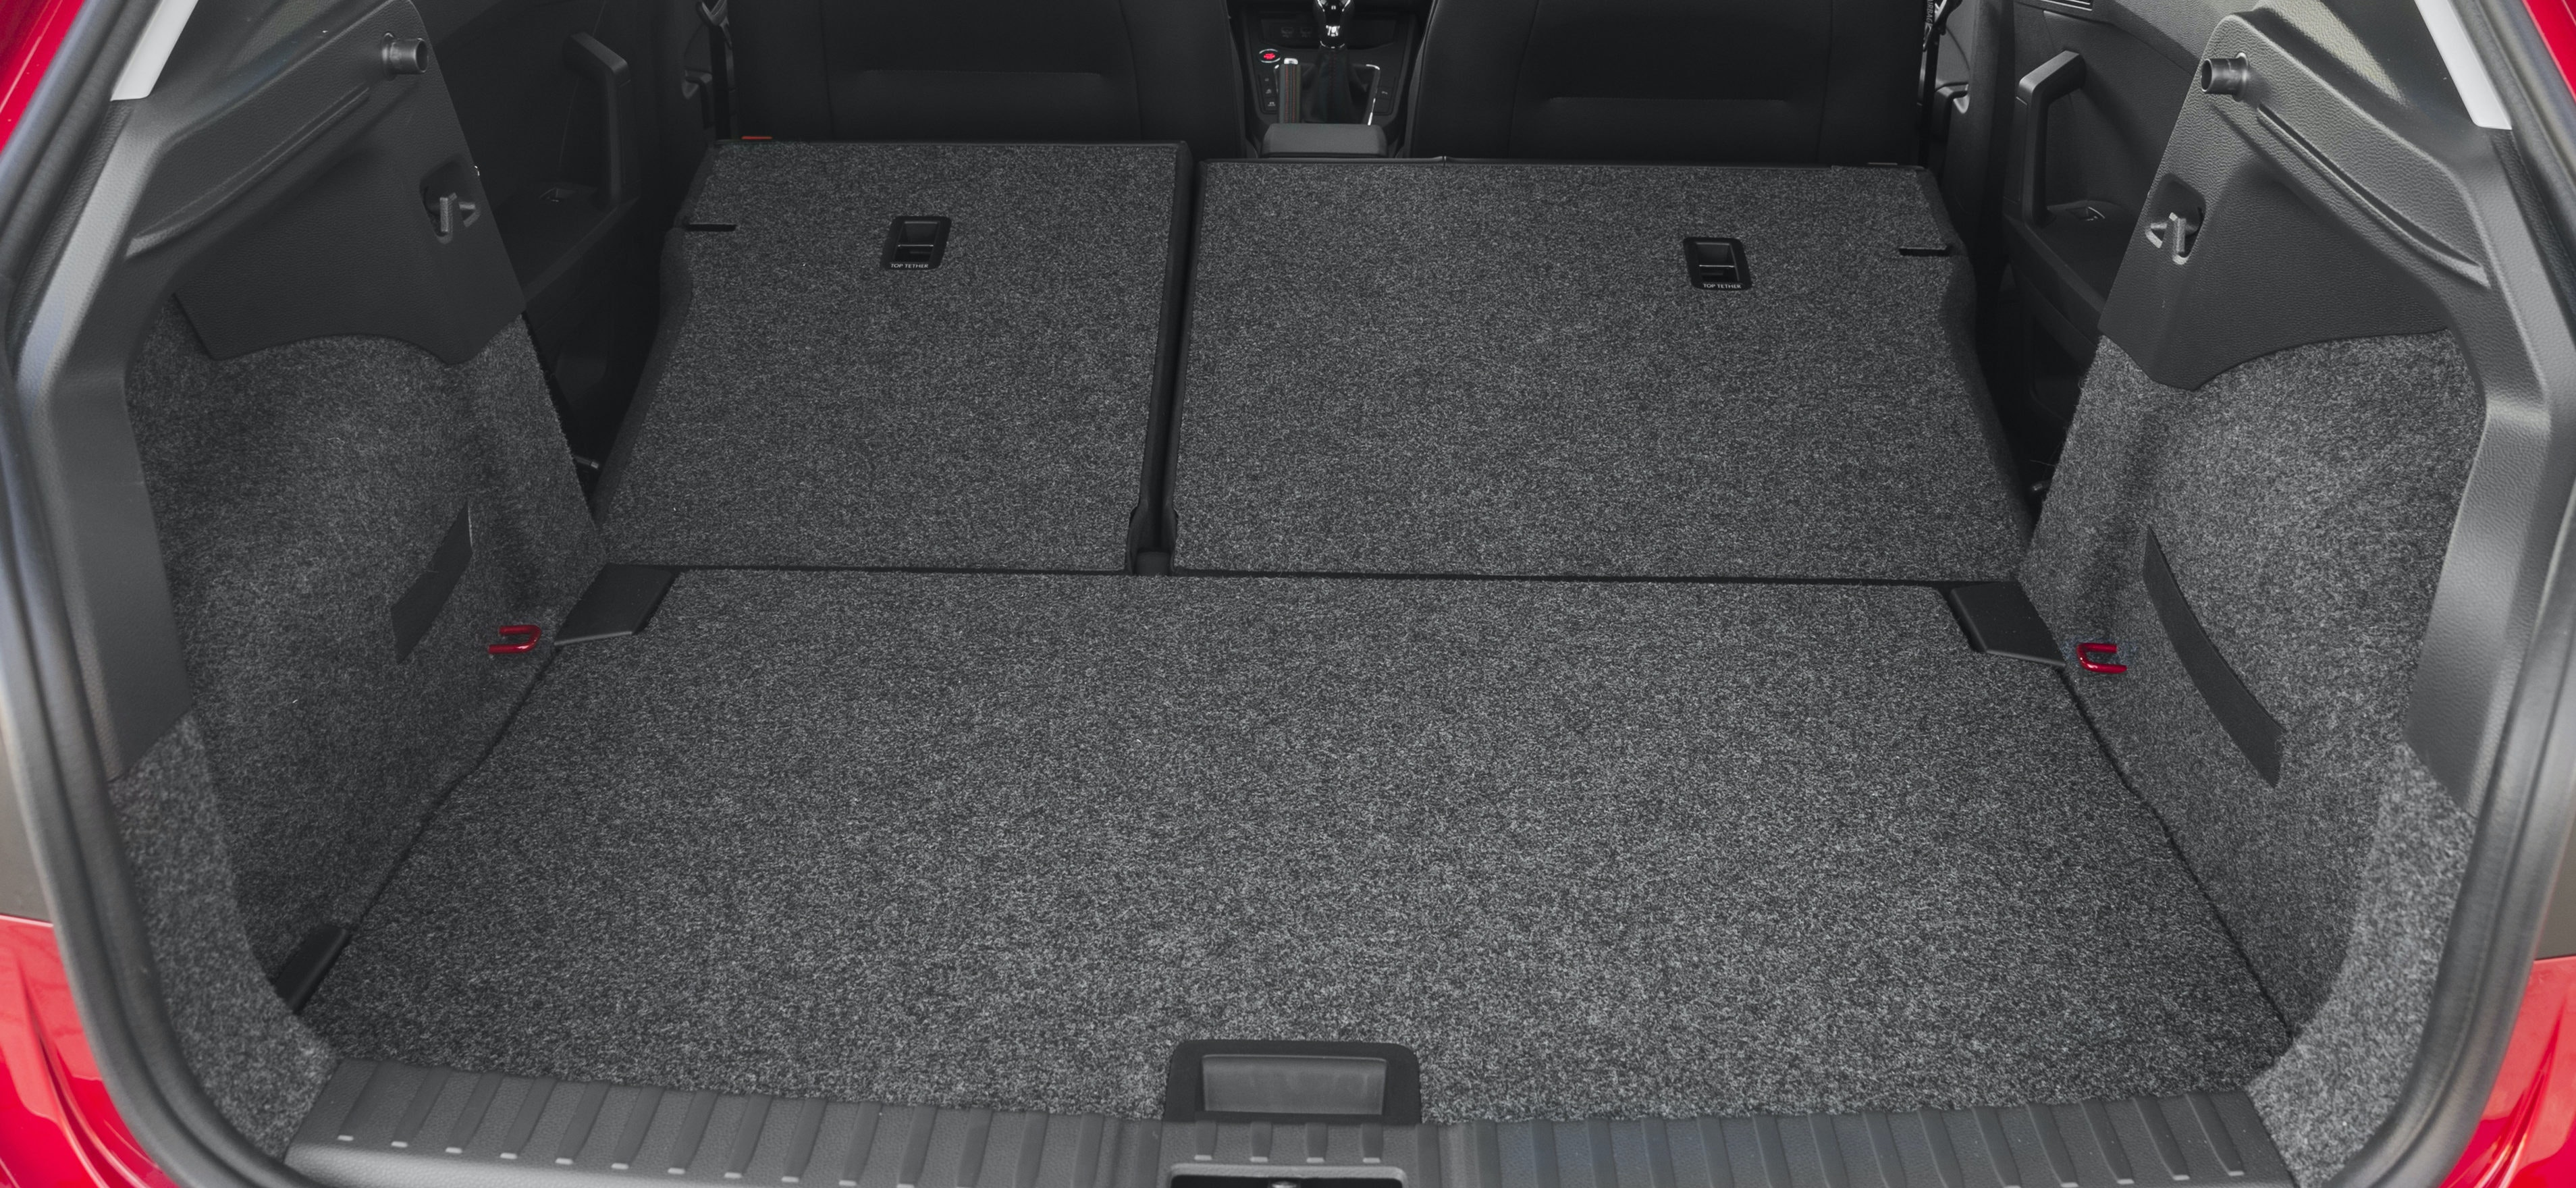 SEAT Ibiza Review | carwow